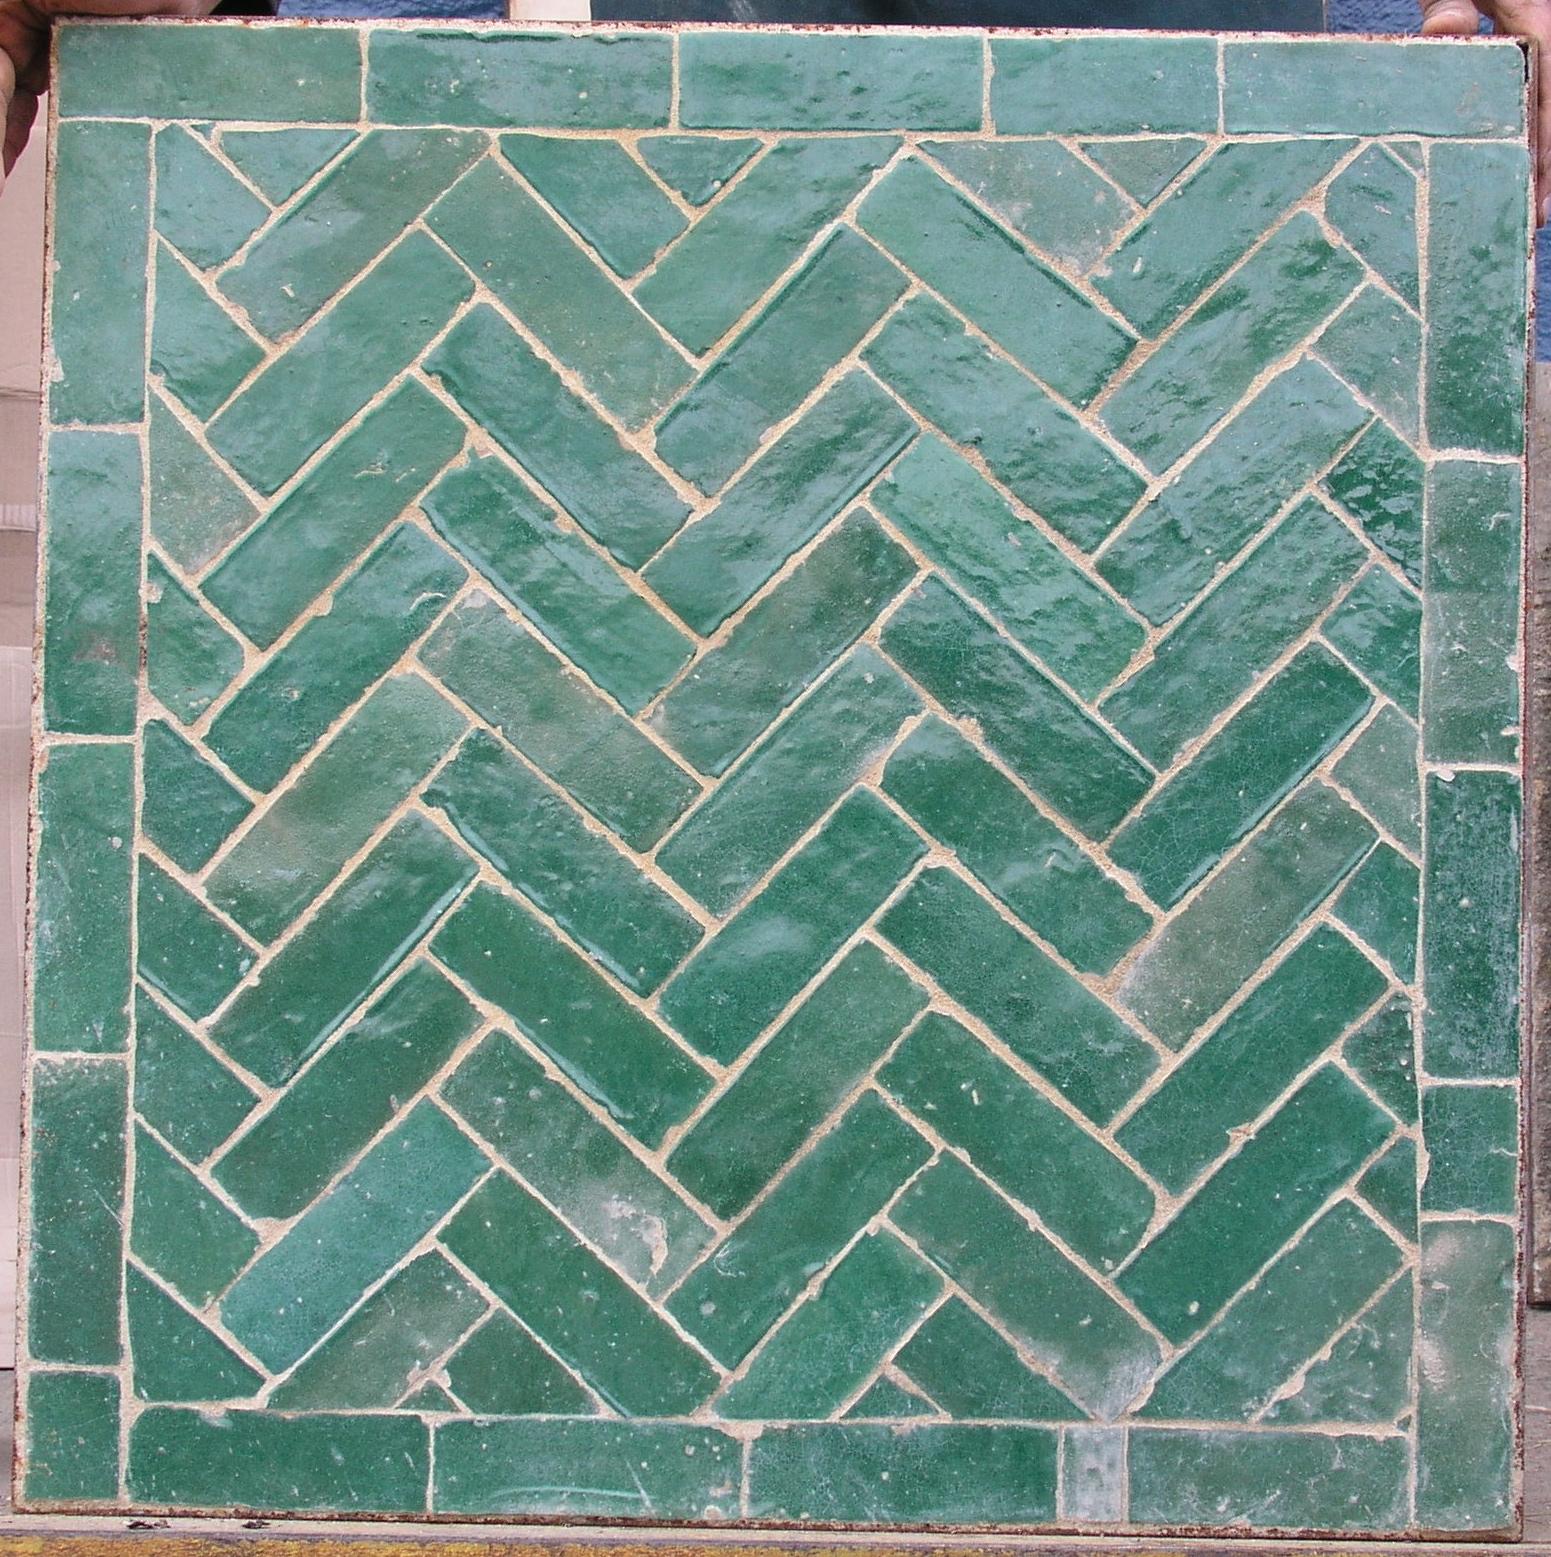 17 Best Images About Terracotta Tiles On Pinterest: Imports From Marrakesh: Bejmat Tile